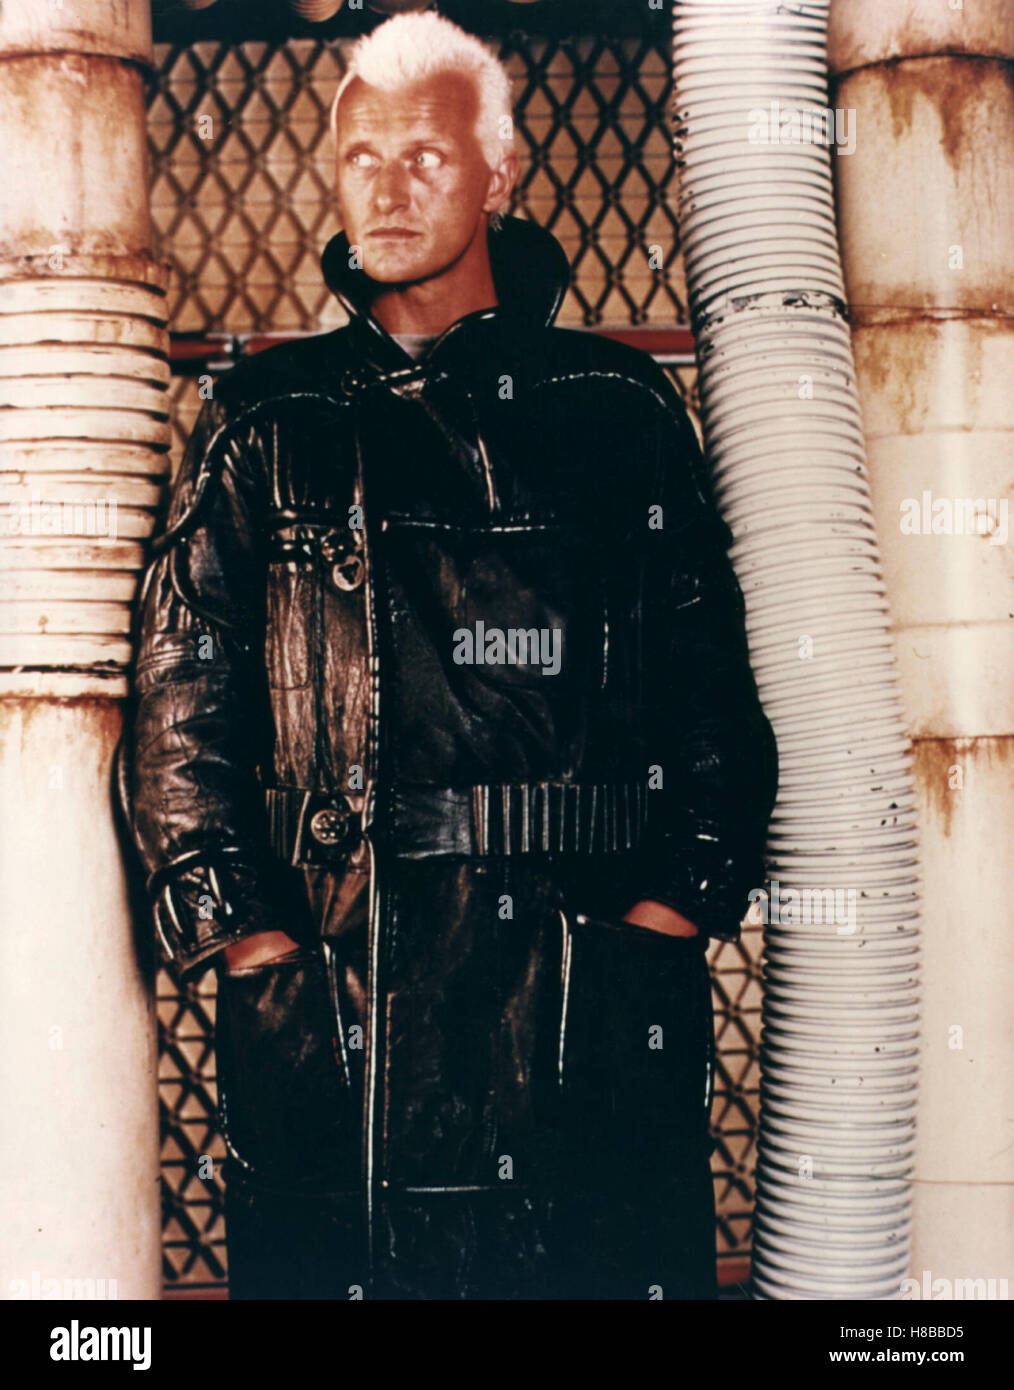 Blade Runner, (BLADE RUNNER) USA 1982, Regie: Ridley Scott, RUTGER HAUER - Stock Image